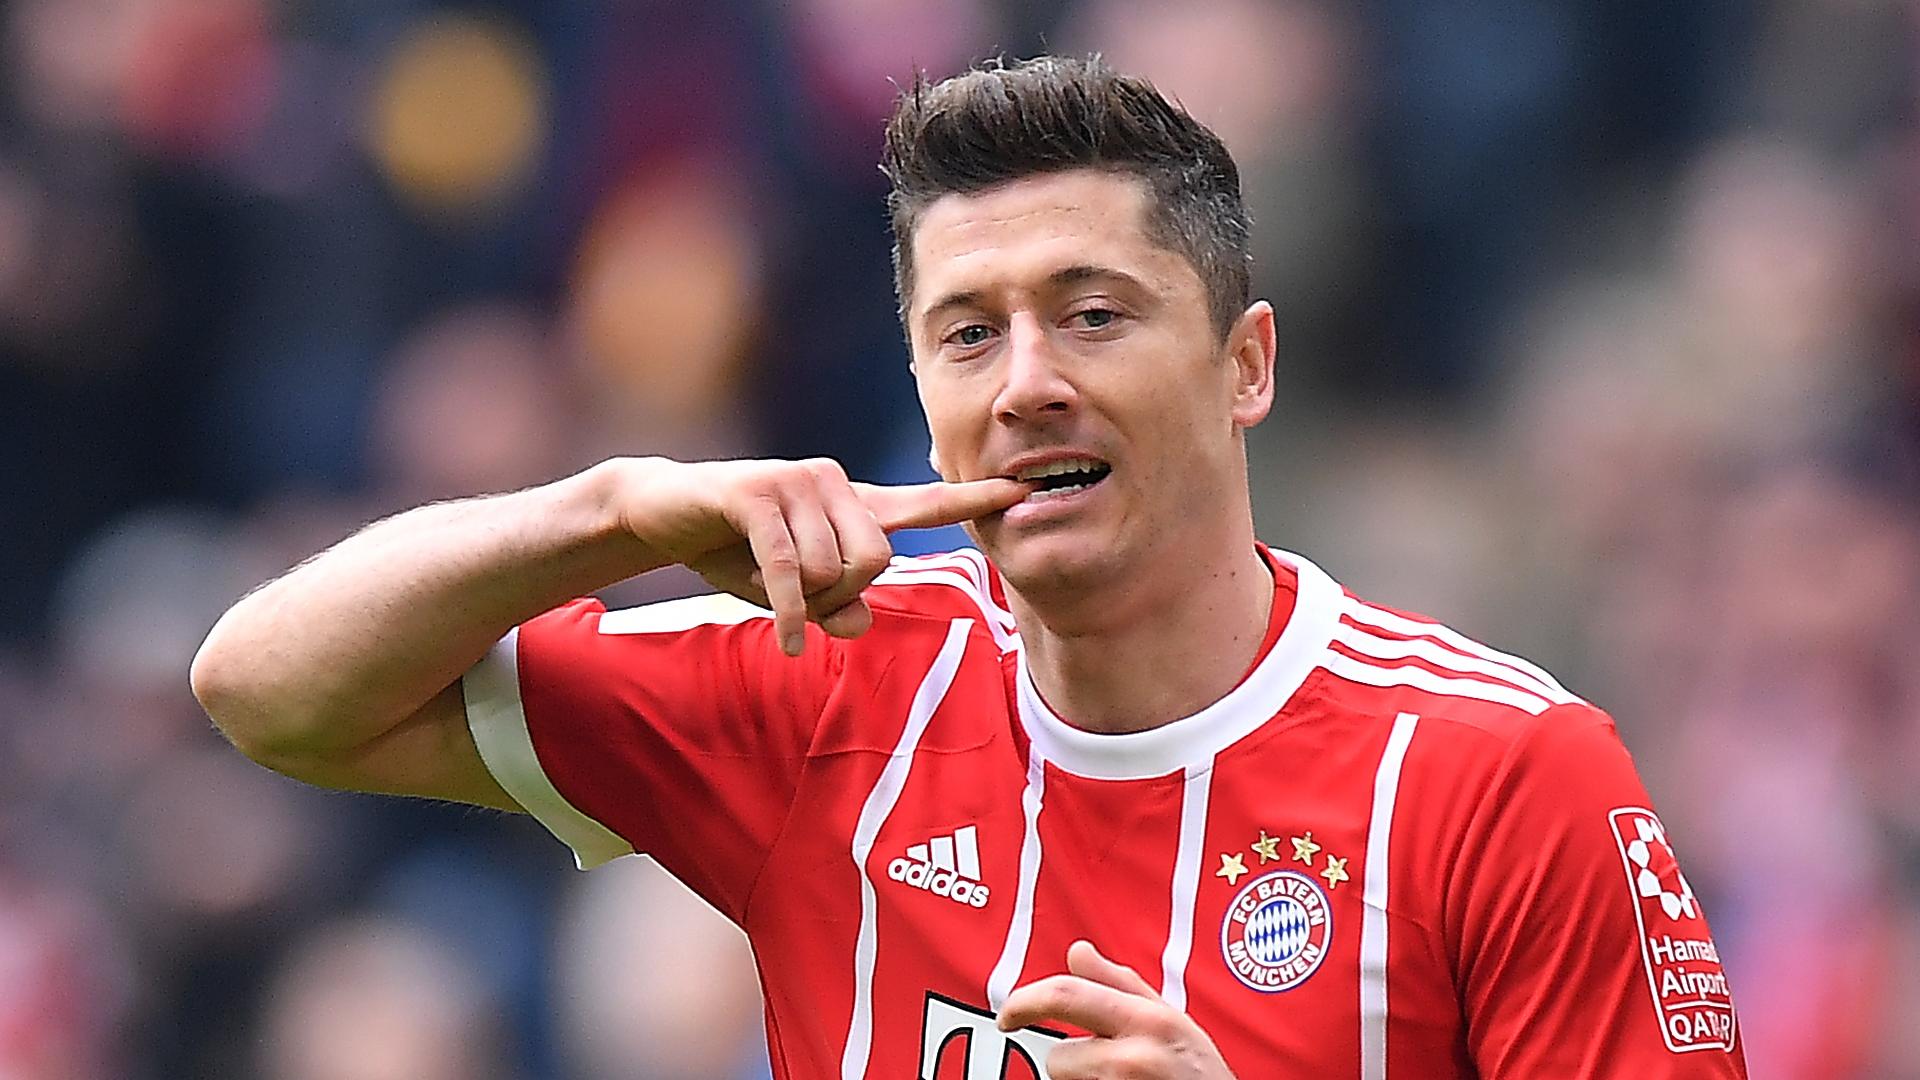 Le Bayern atomise Hambourg, Lewandowski et Ribéry se régalent